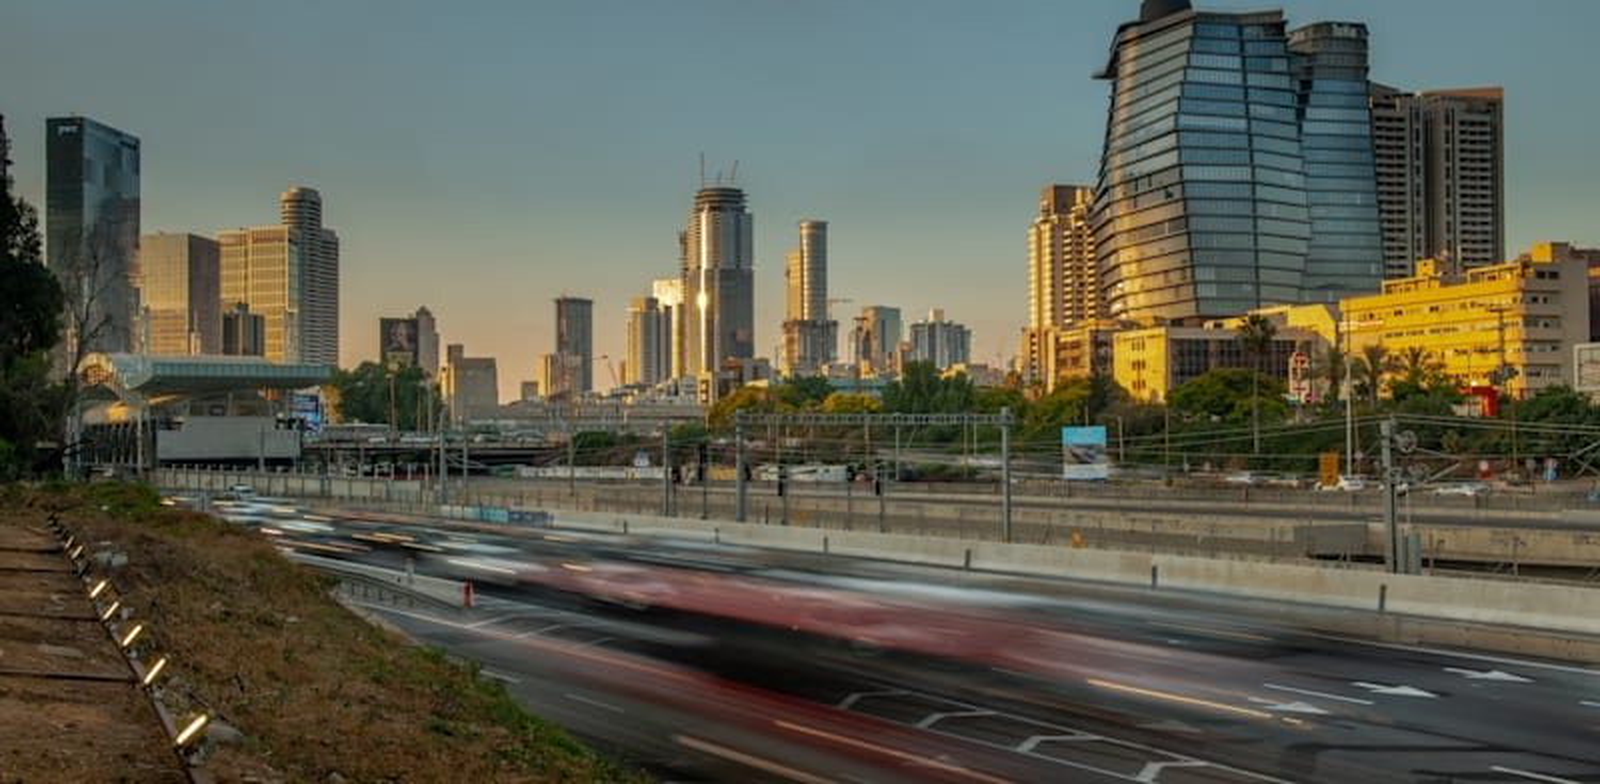 Tel Aviv offices  credit: Shutterstock